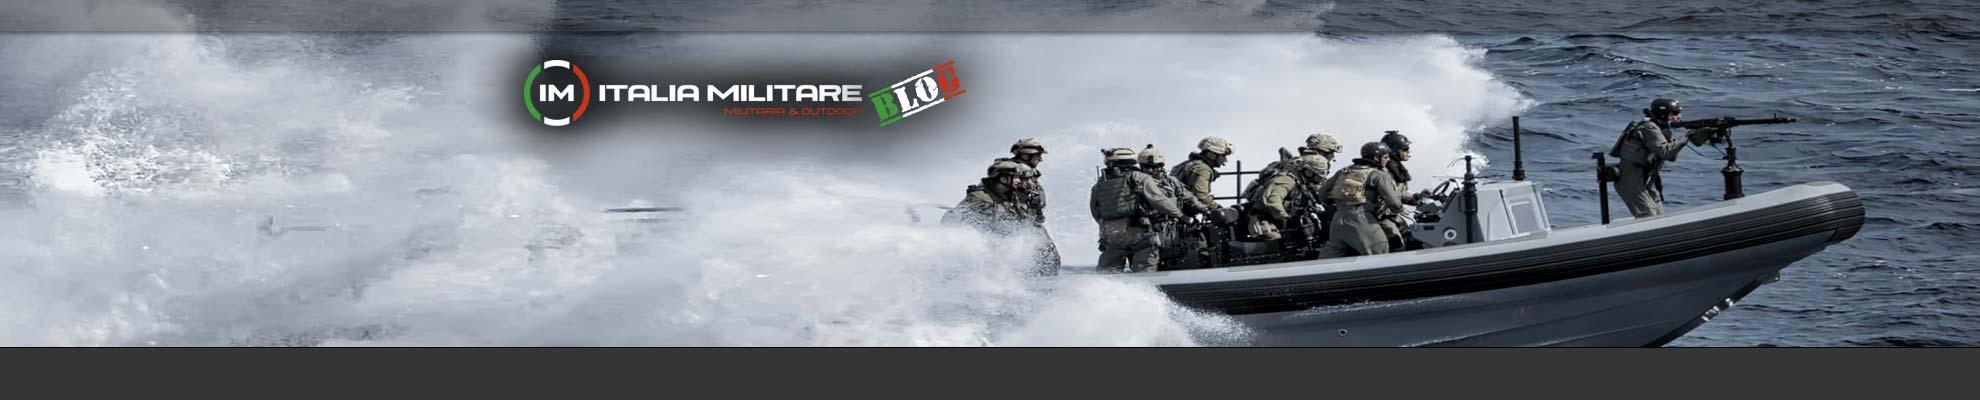 marina-militare-goi-banner-2